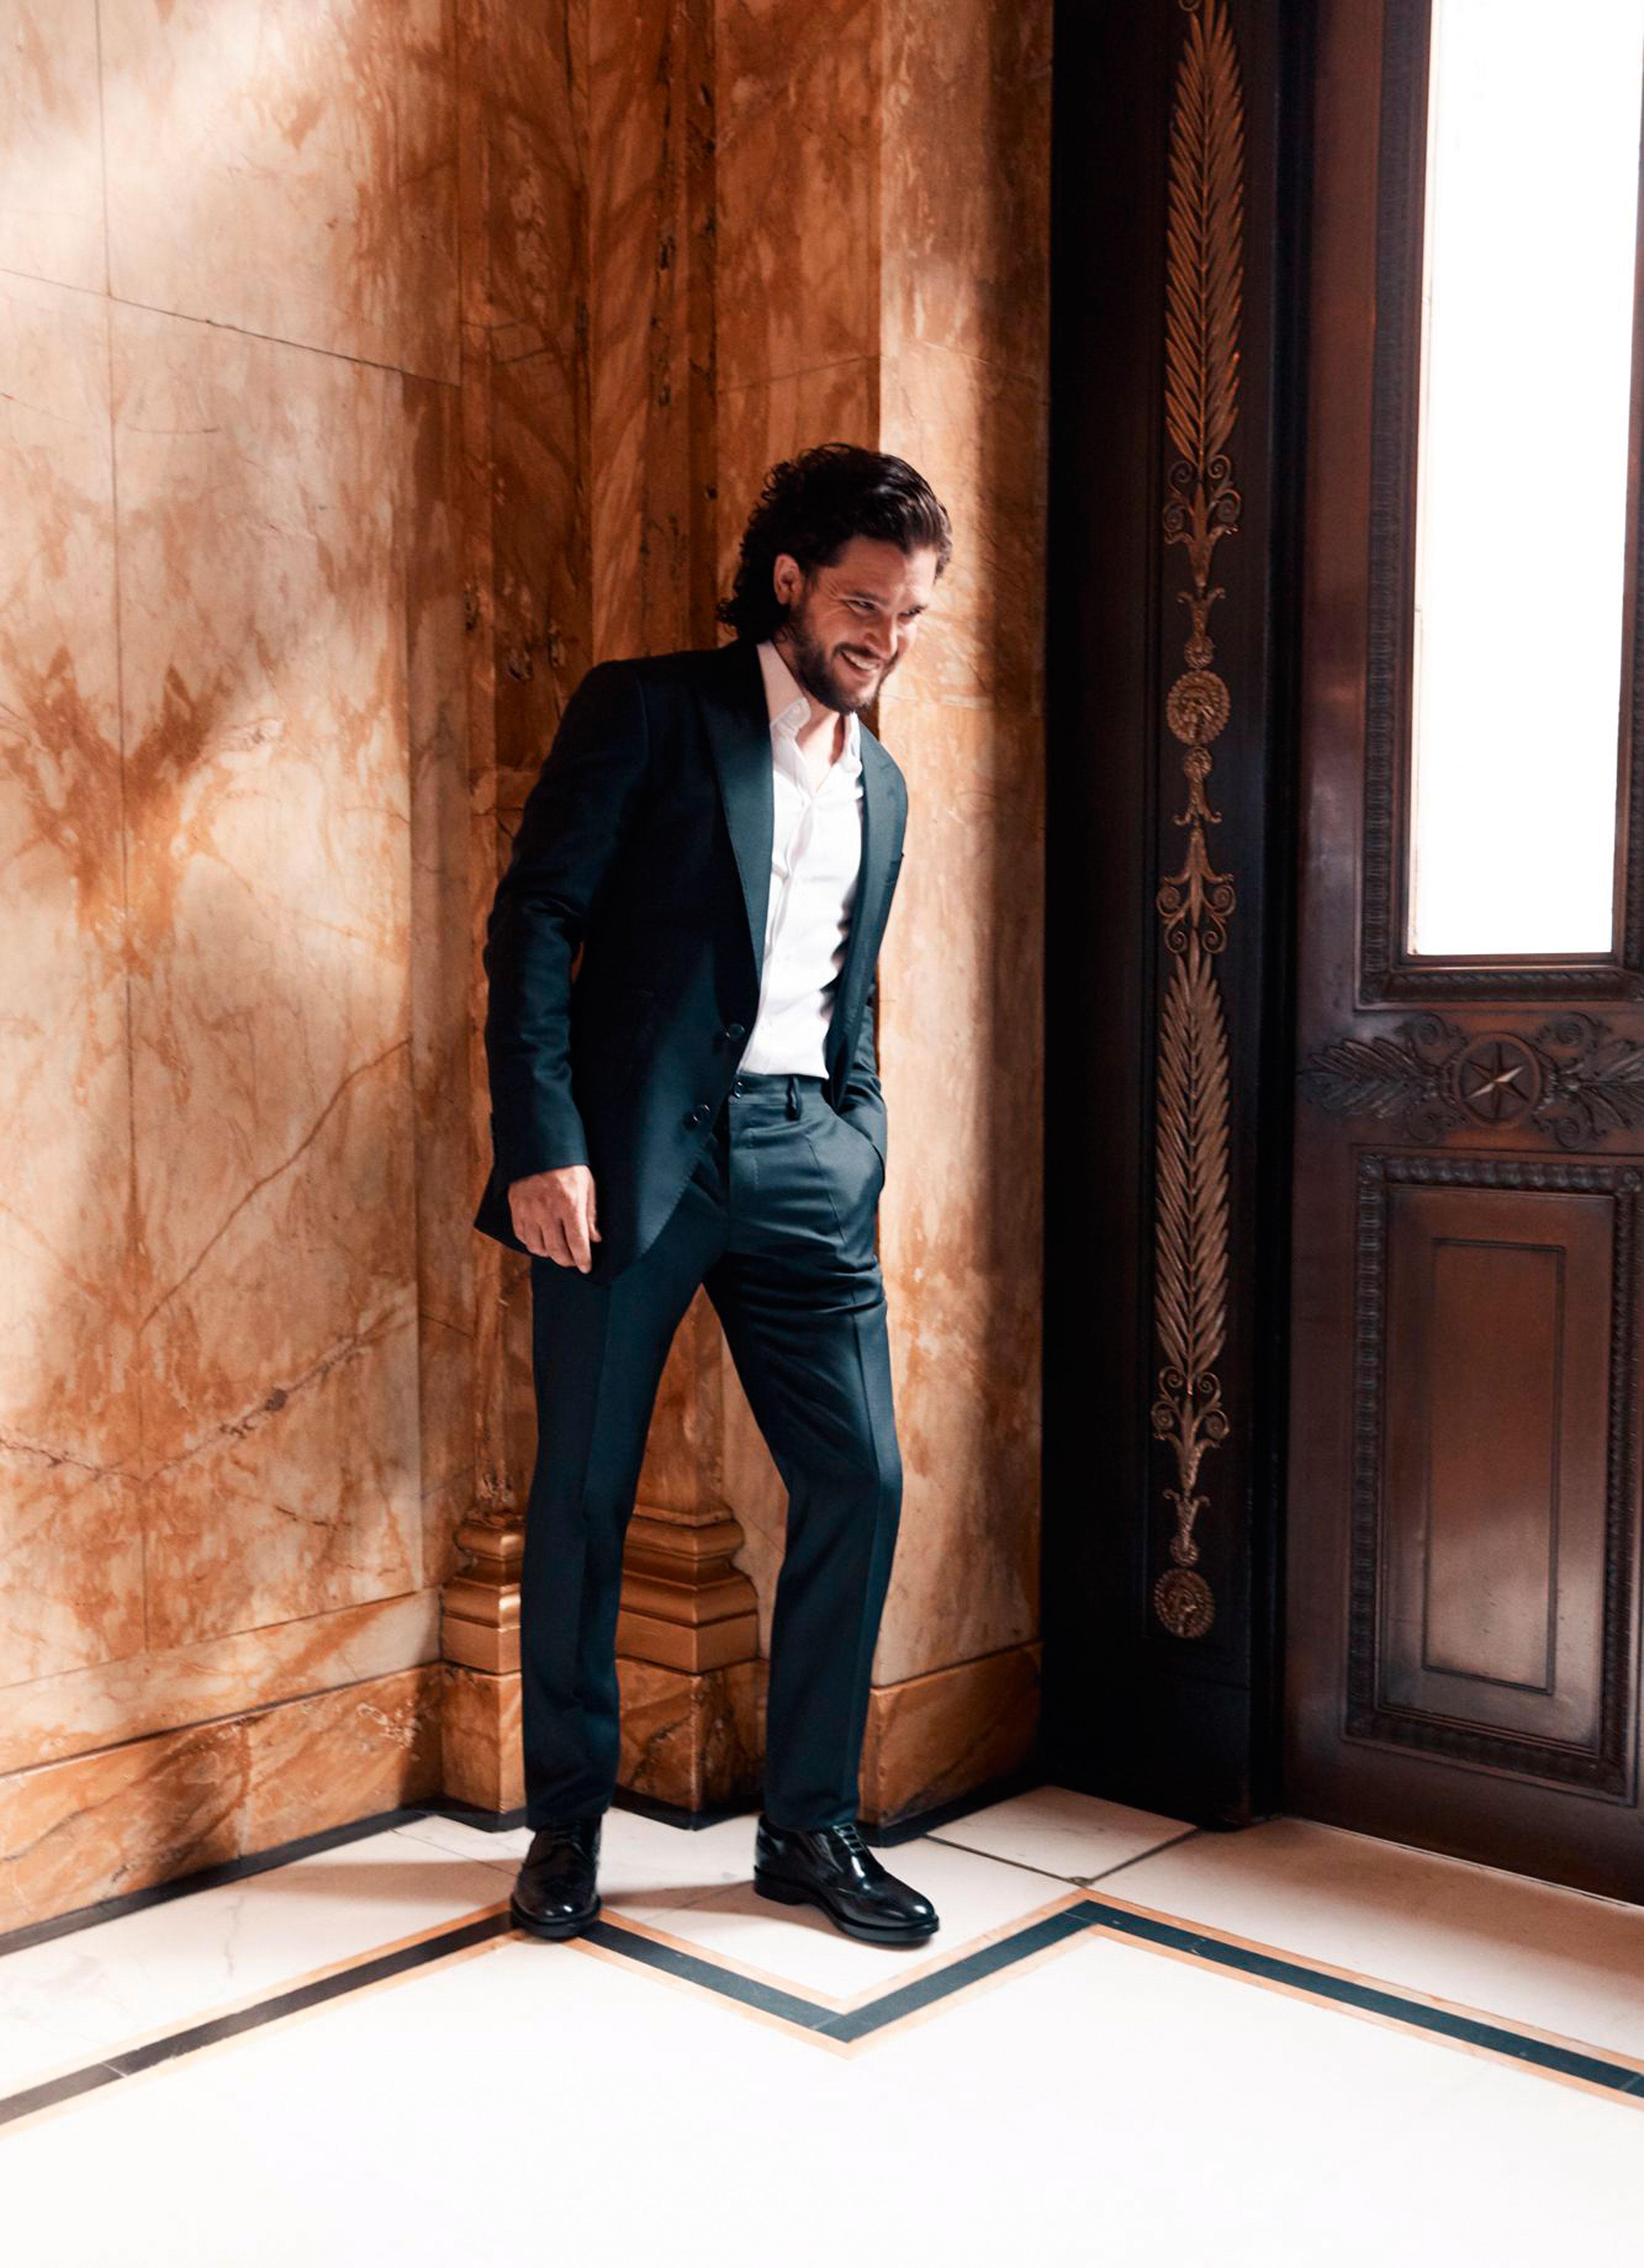 Костюм, рубашка, дерби, все Dolce&Gabbana